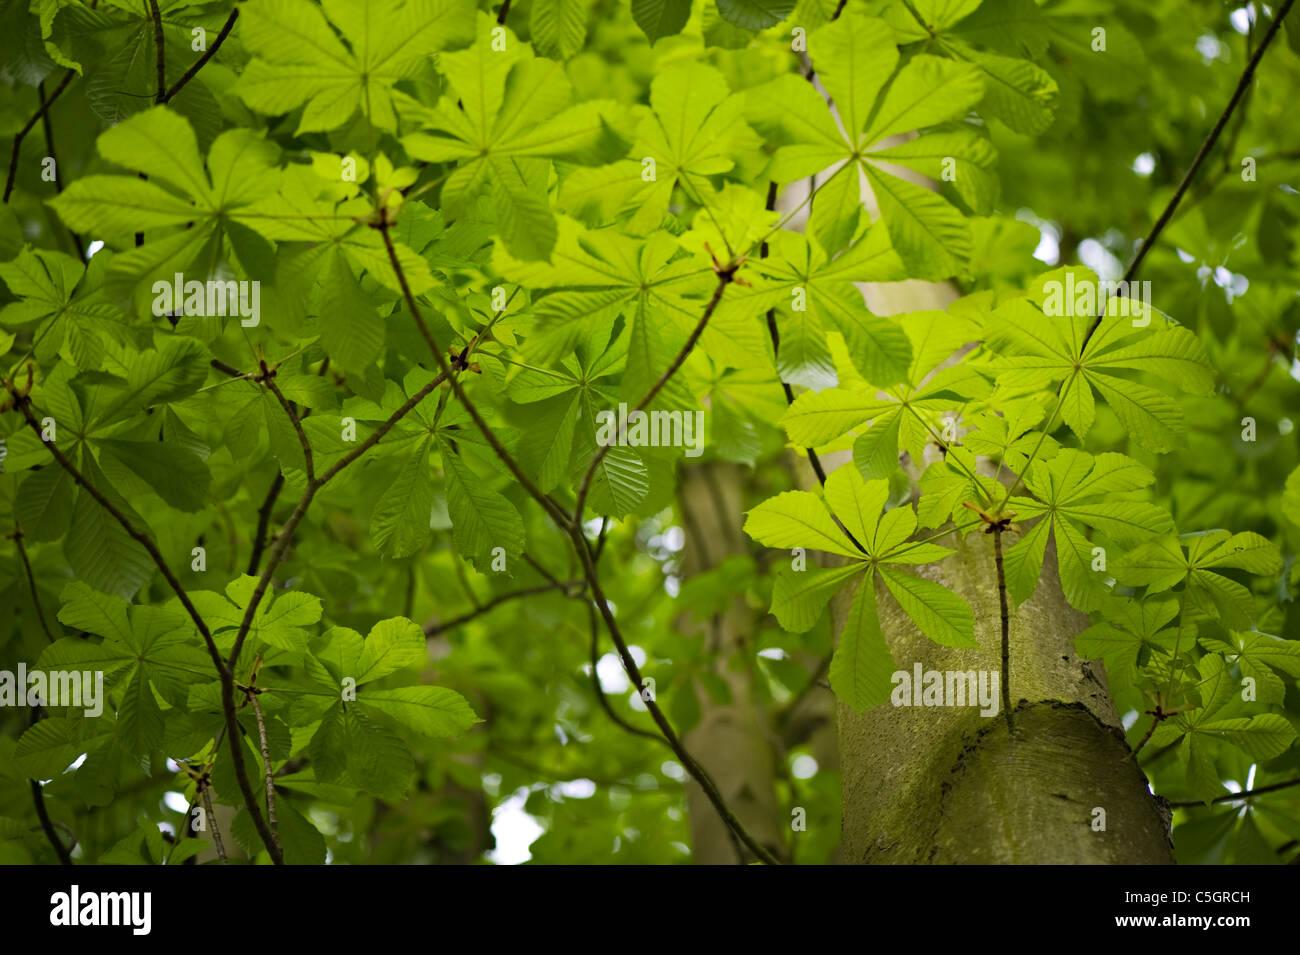 Aesculus hippocastanum - horse chestnut tree, conker tree - Stock Image